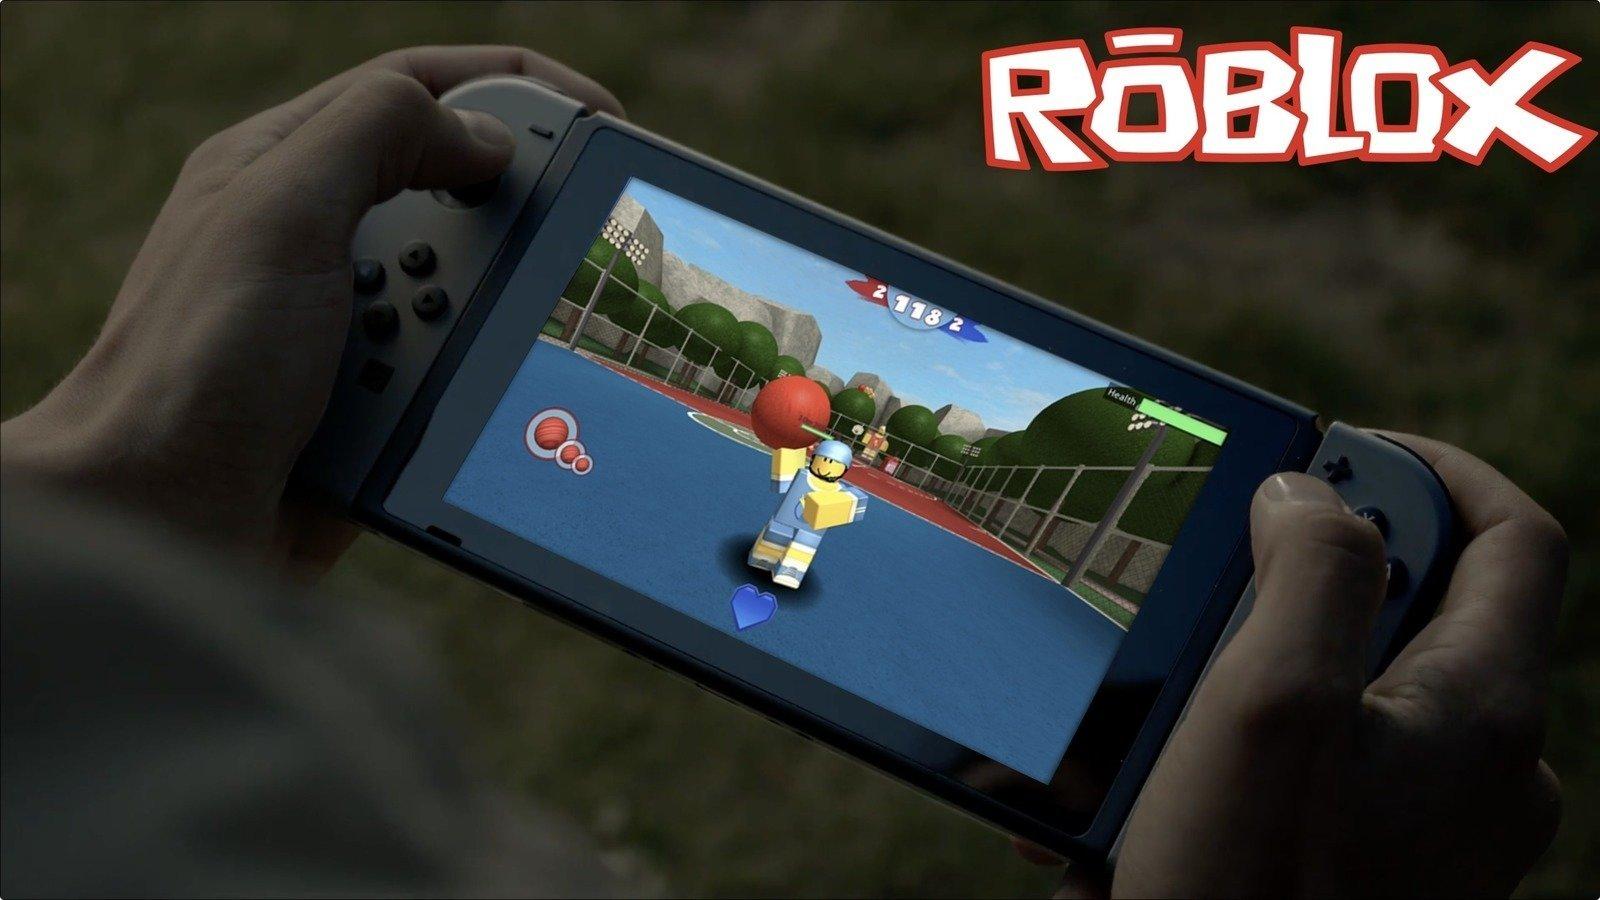 roblox video game console